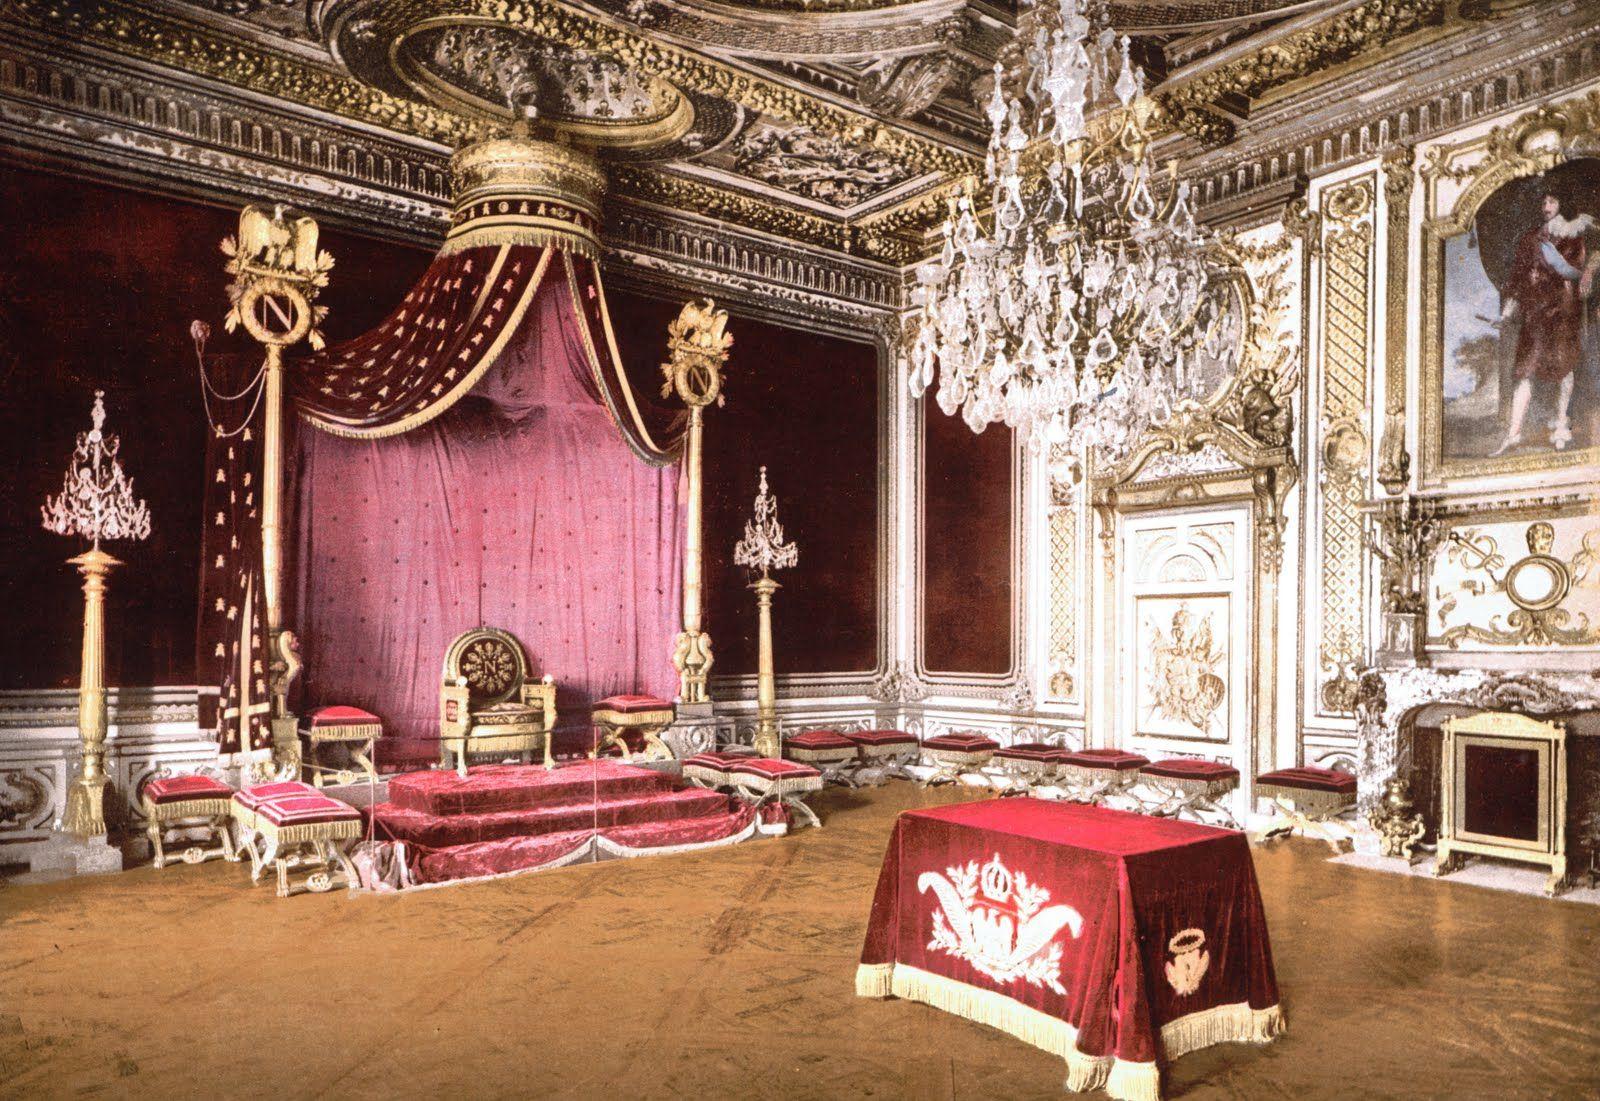 Directoire, French Empire: Le Salle du Trone a Napoleon, Fontainebleau